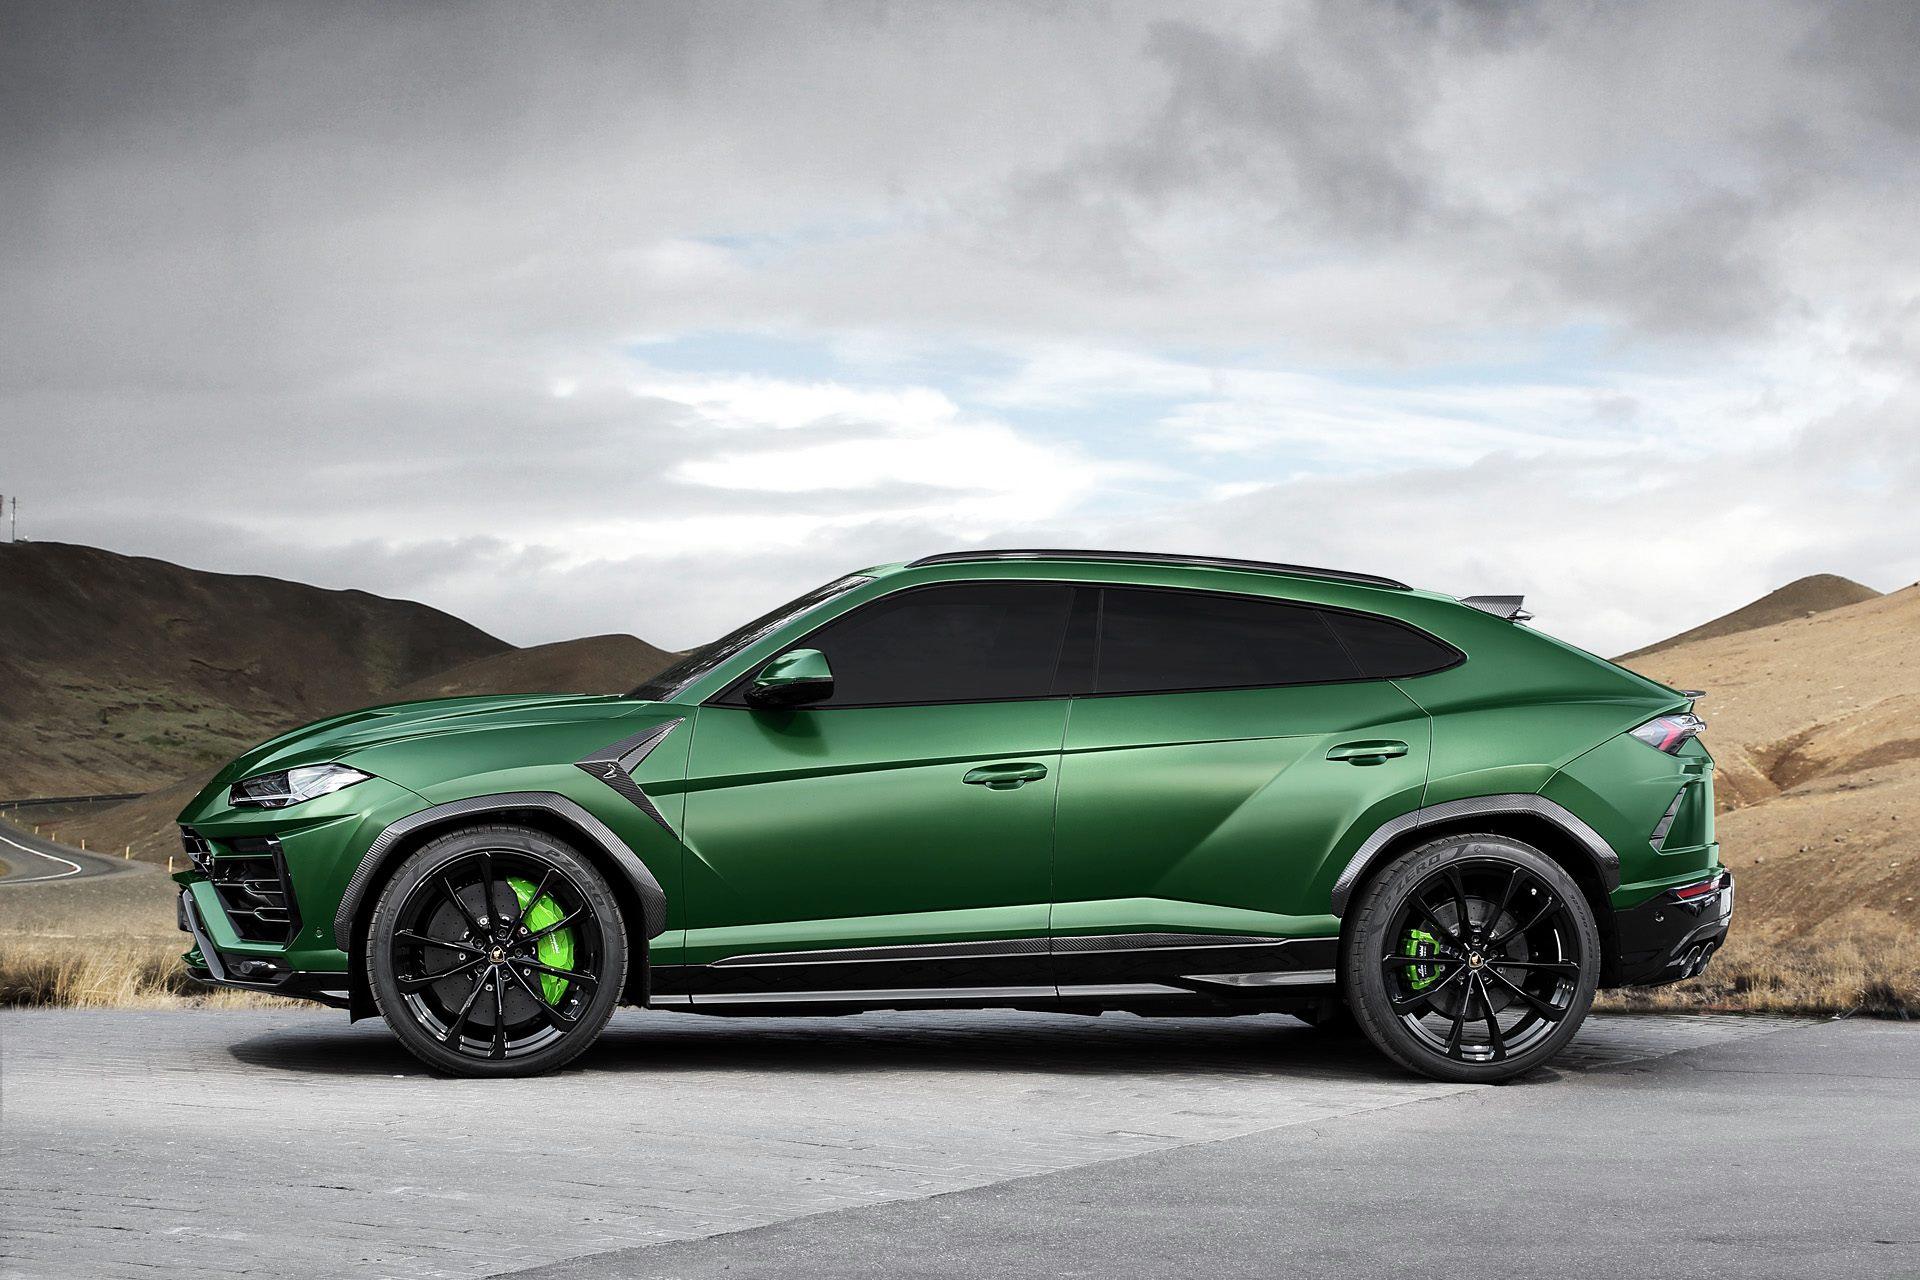 TopCar Lamborghini Urus Revealed With Military Green Paint